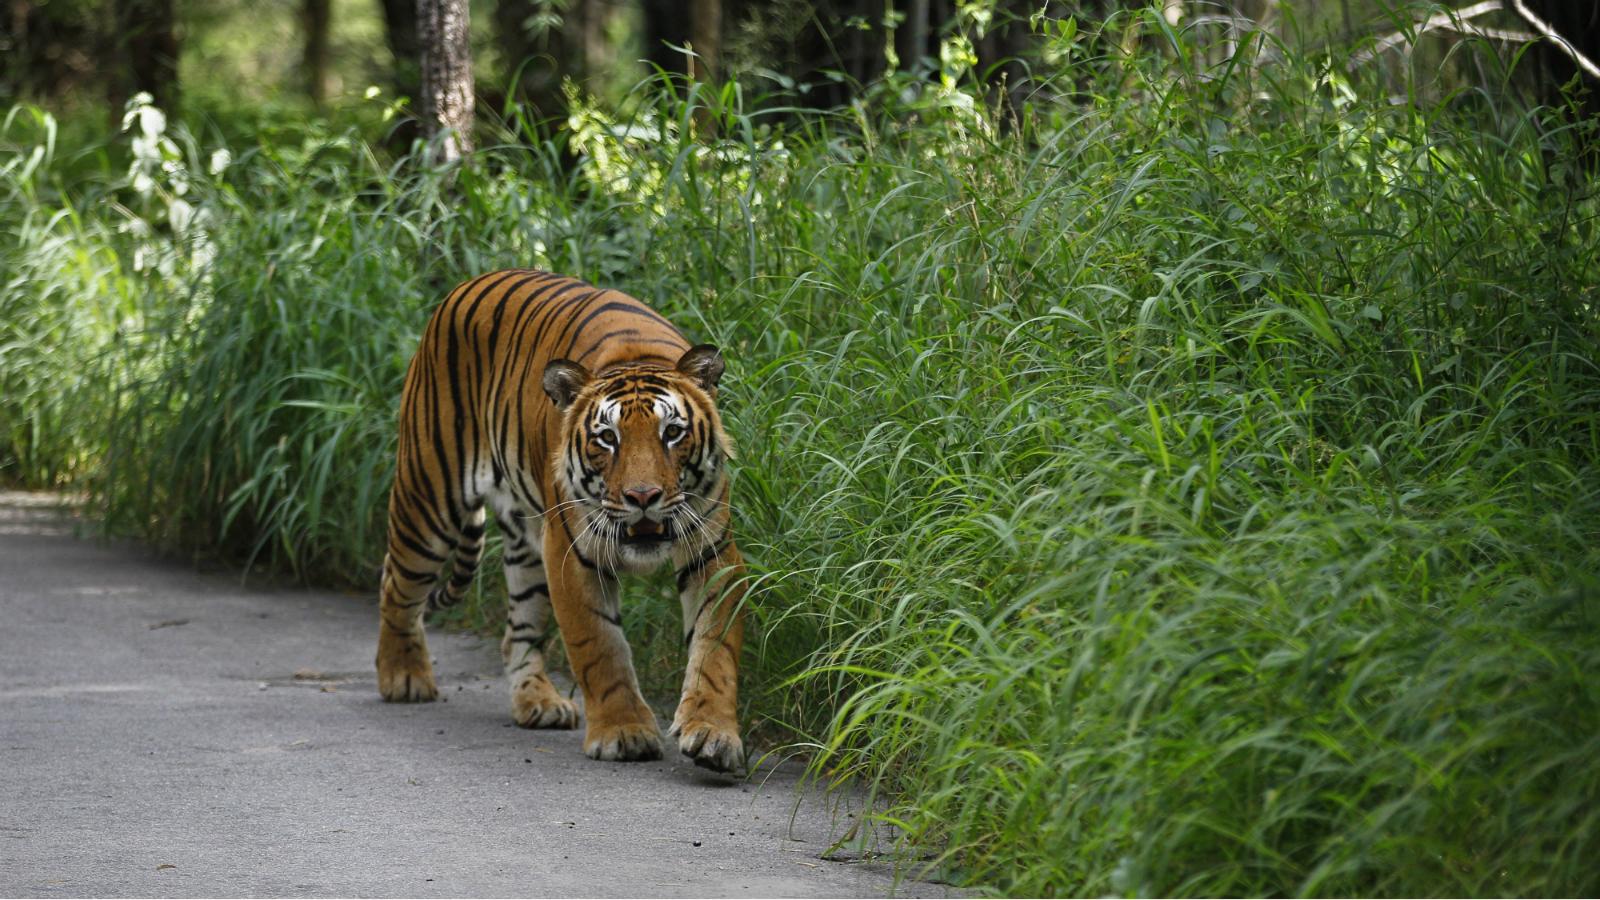 India-Tiger-Wildlife-Environment